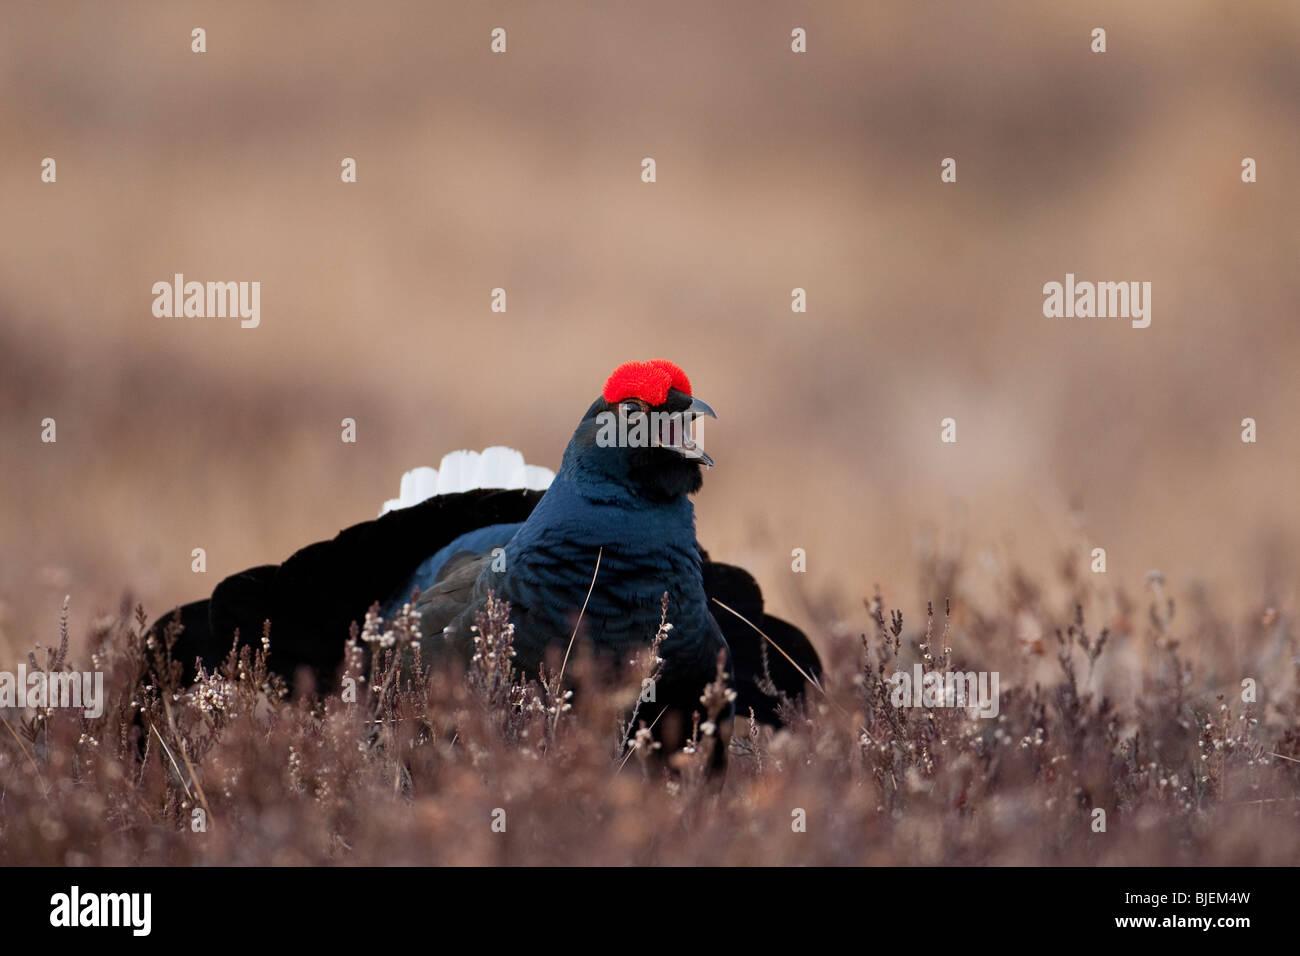 Black grouse (Lyrurus tetrix) in meadow, South Sweden - Stock Image